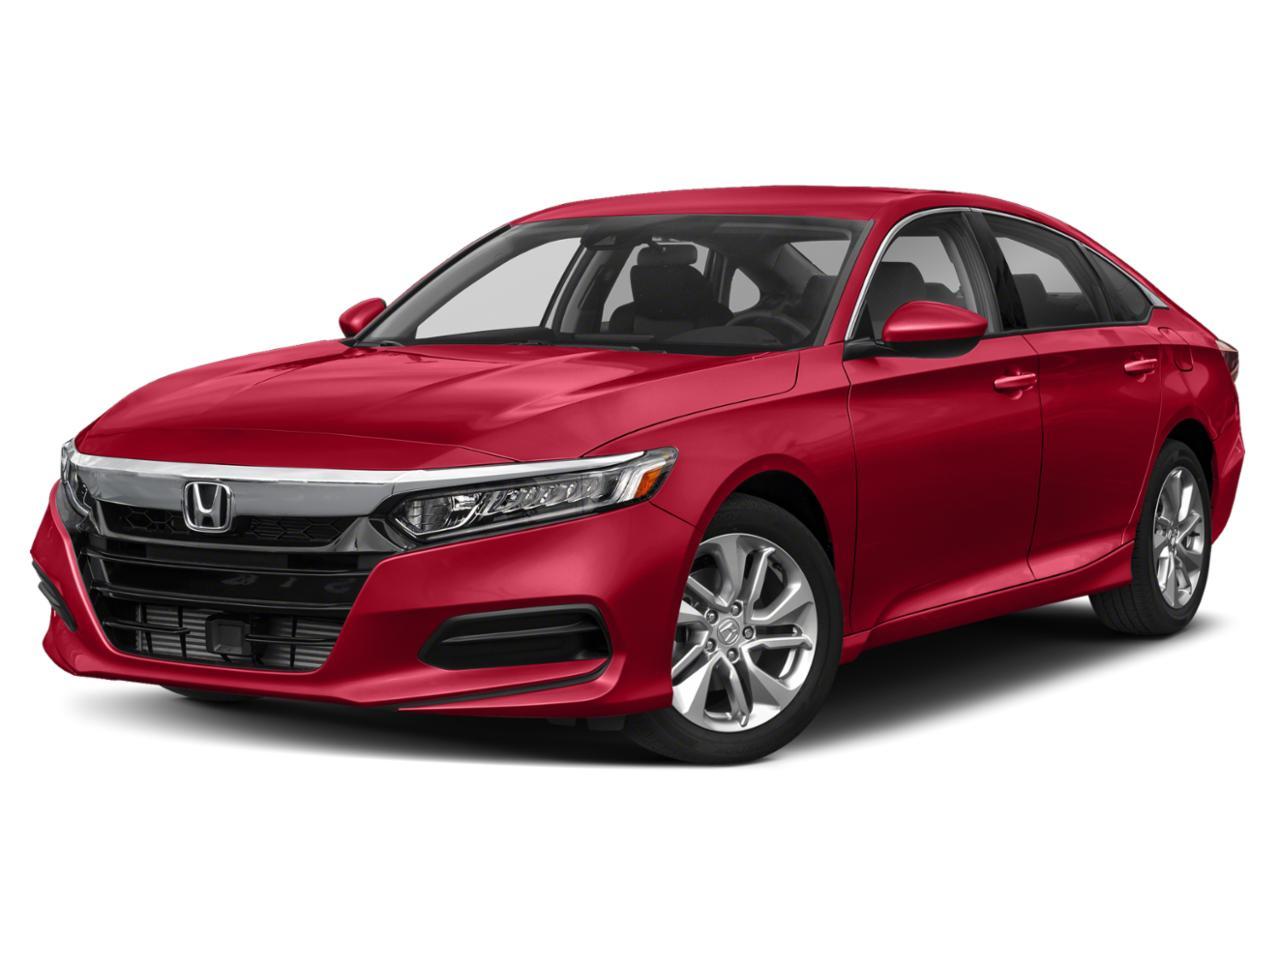 2019 Honda Accord Sedan Vehicle Photo in Richmond, TX 77469